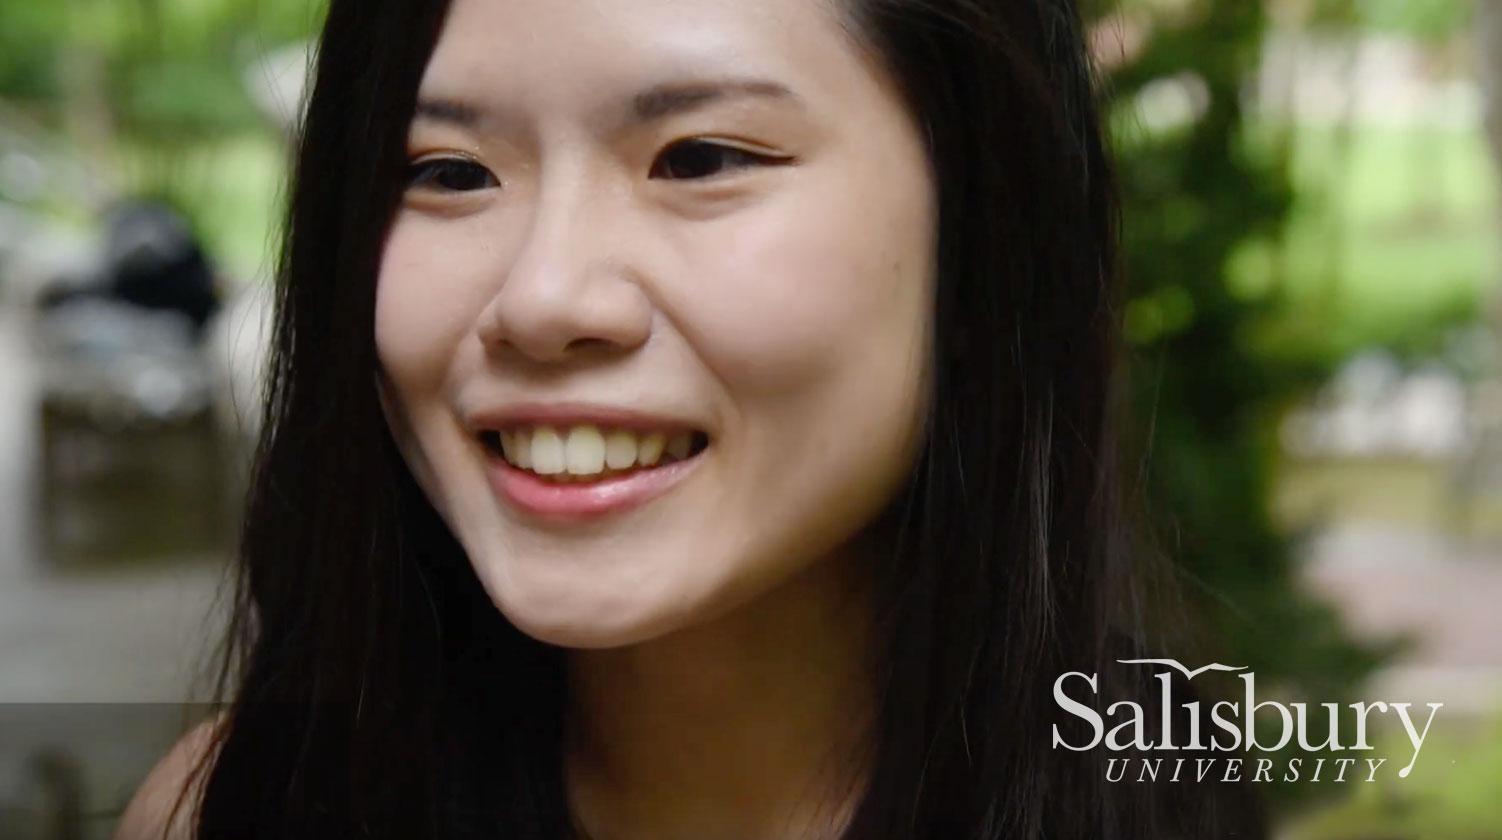 International Student talking to camera